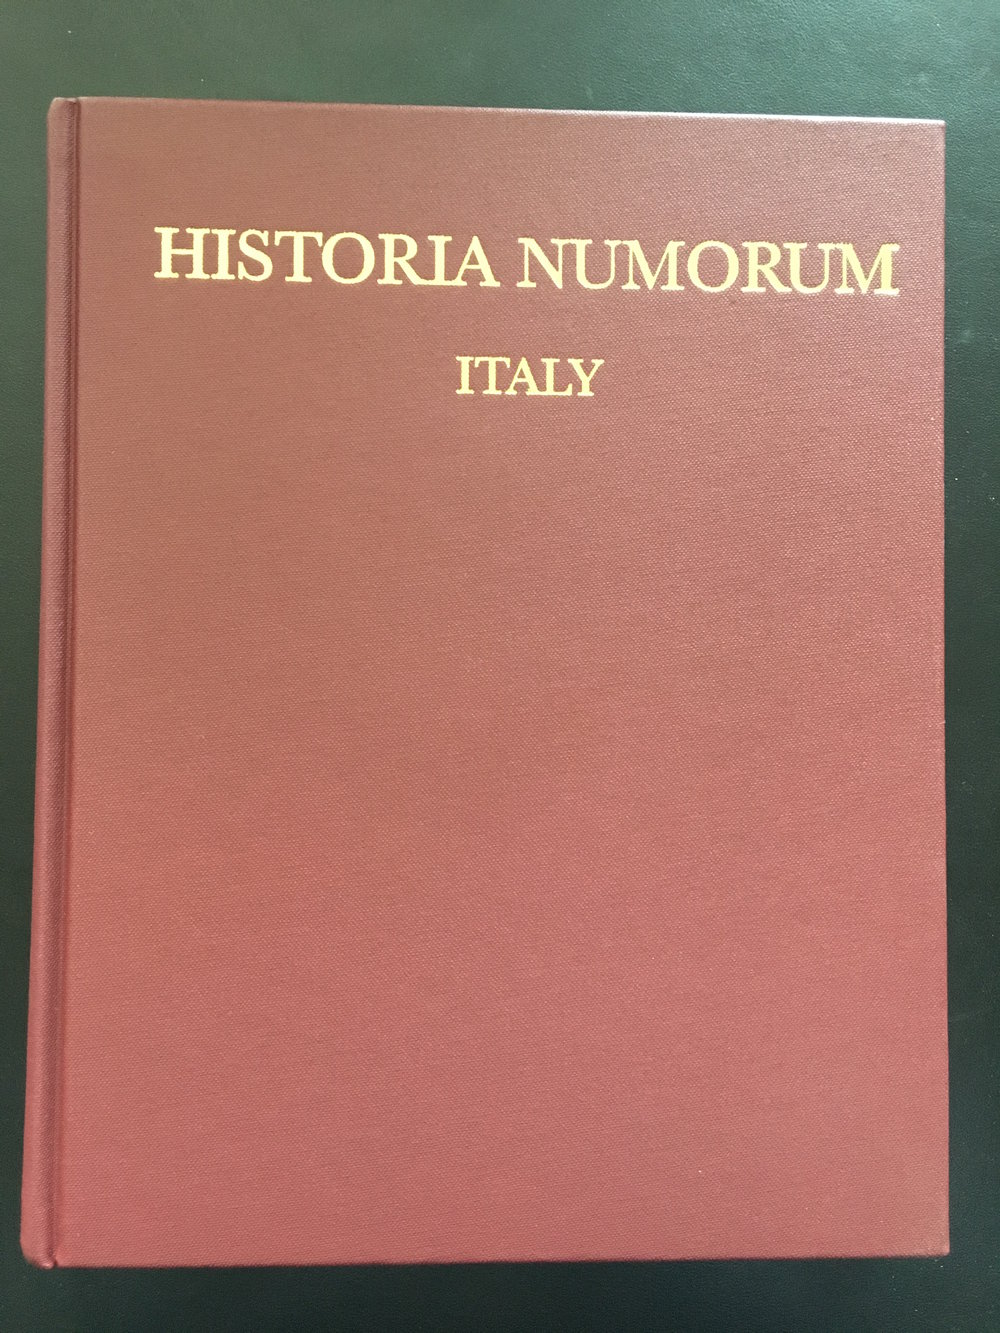 Historia Numorum Italy